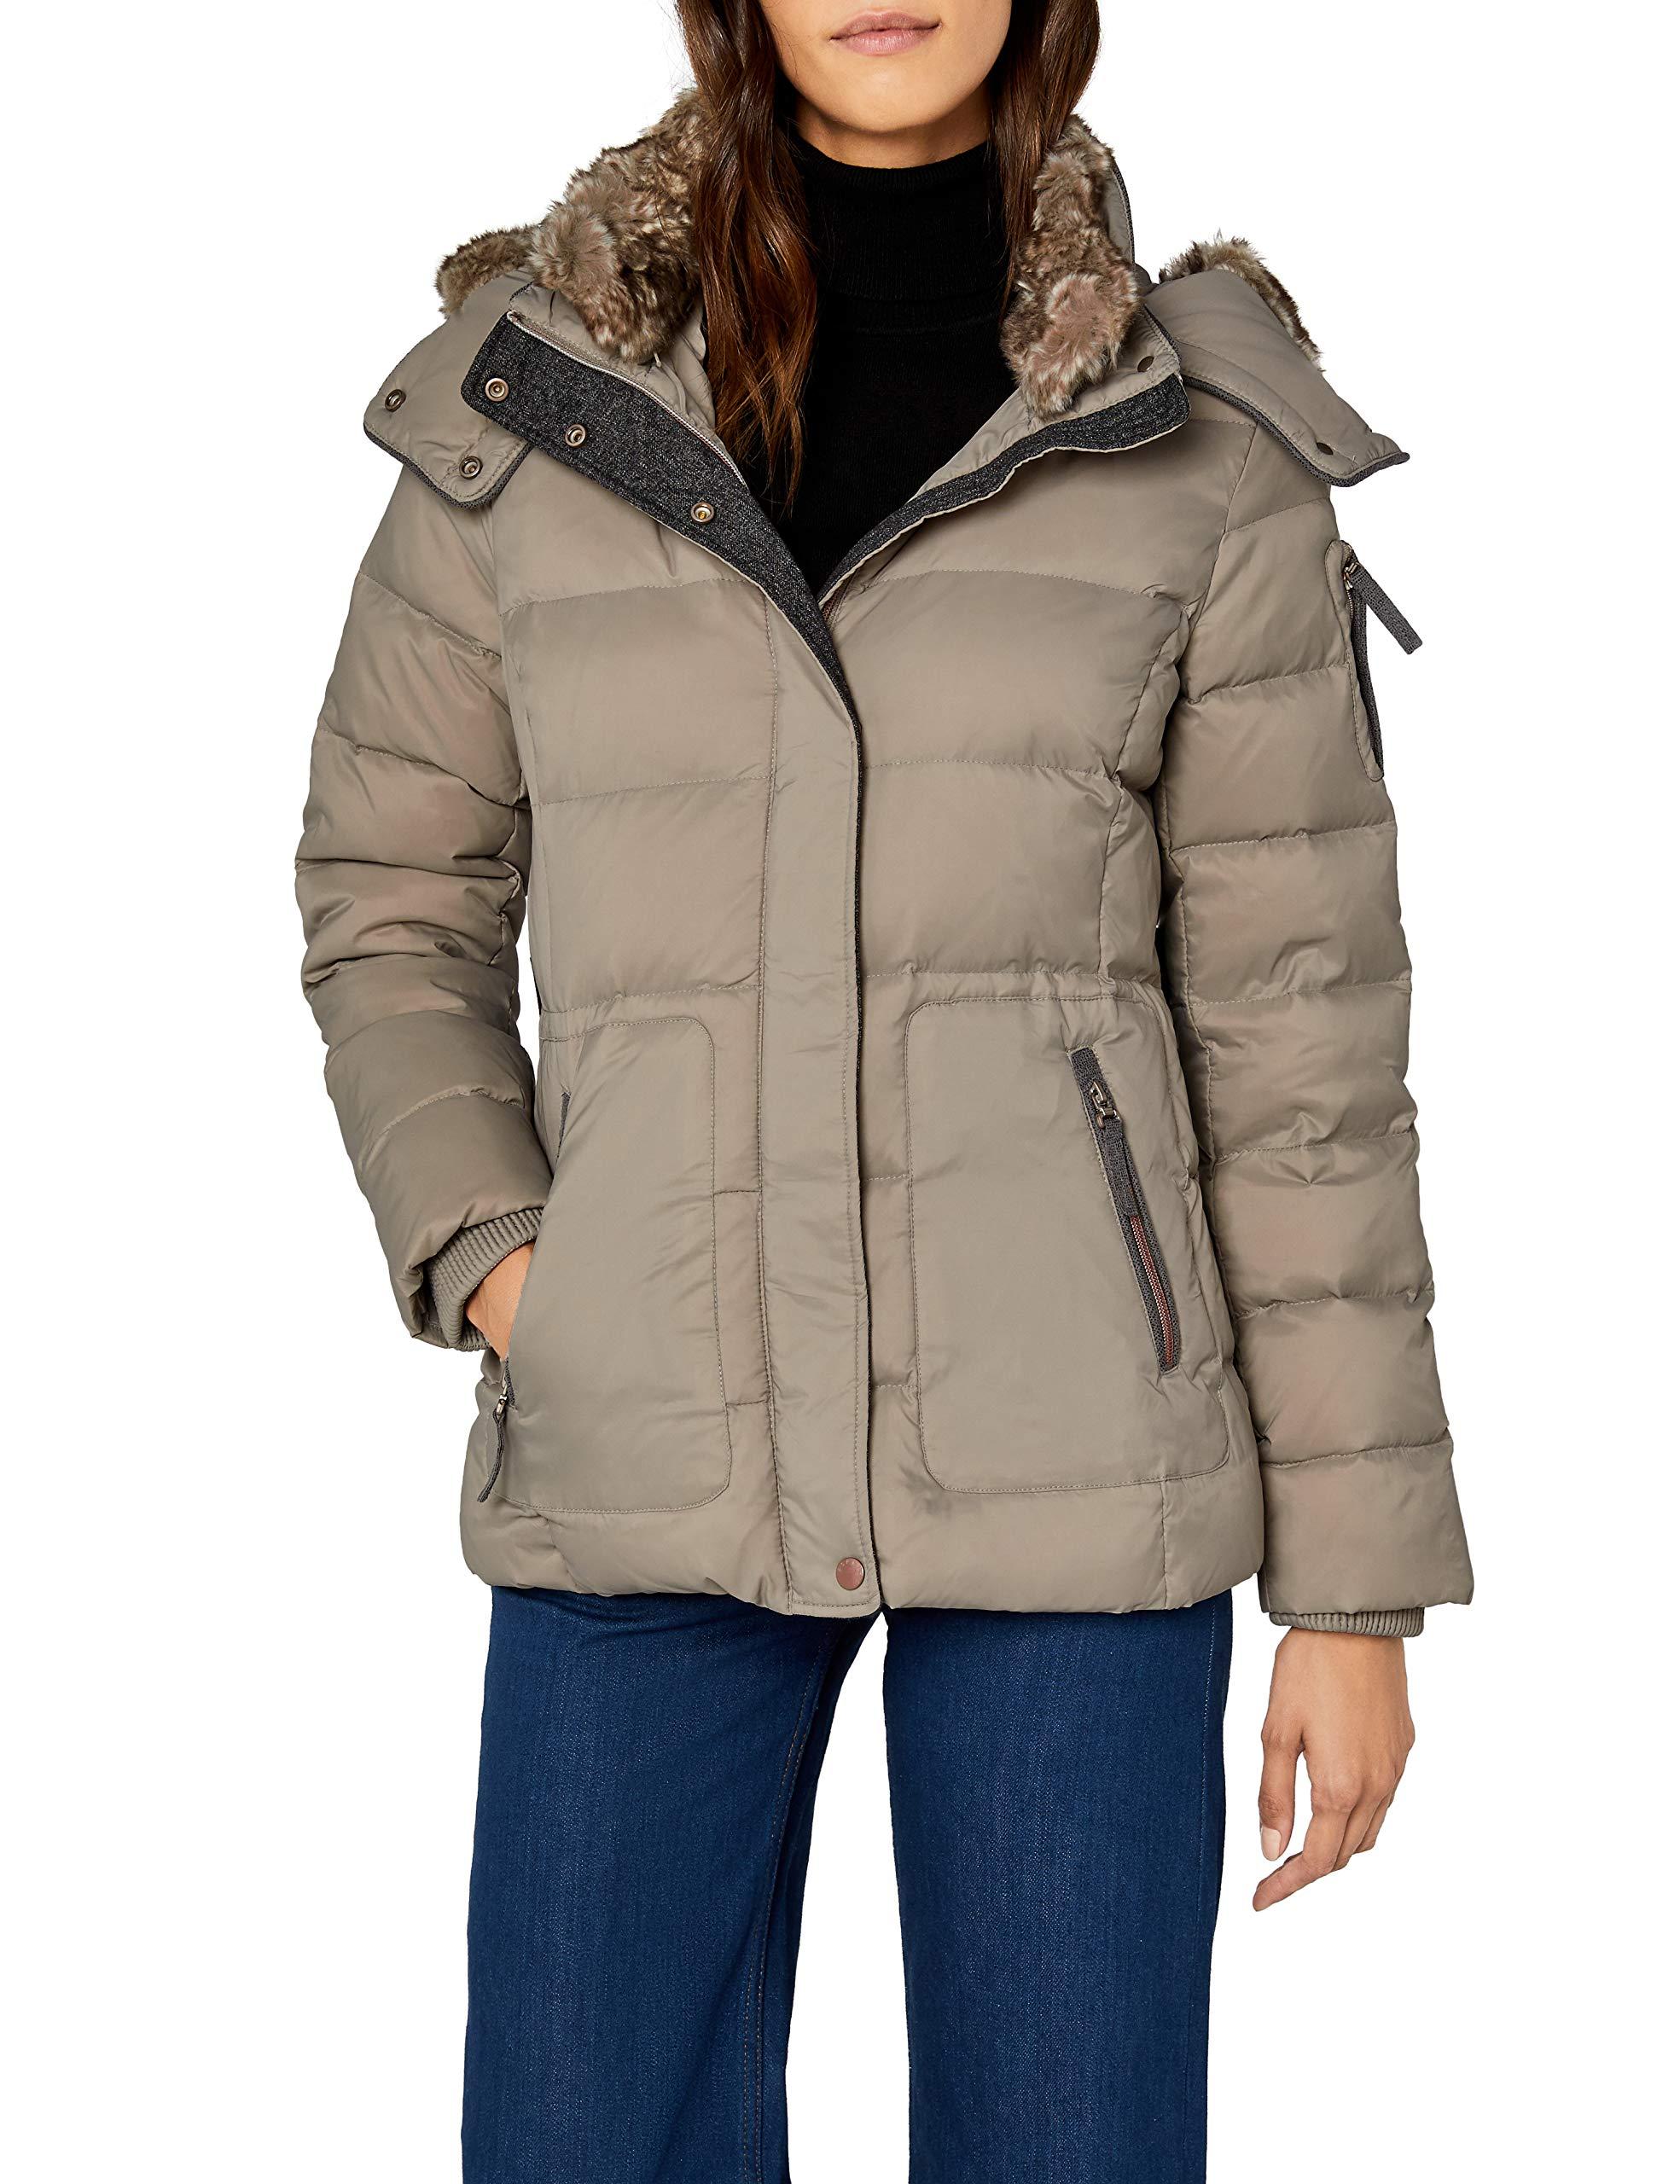 0883c23f02f9e Mejor valorados en Ropa de abrigo para mujer   Opiniones útiles de ...